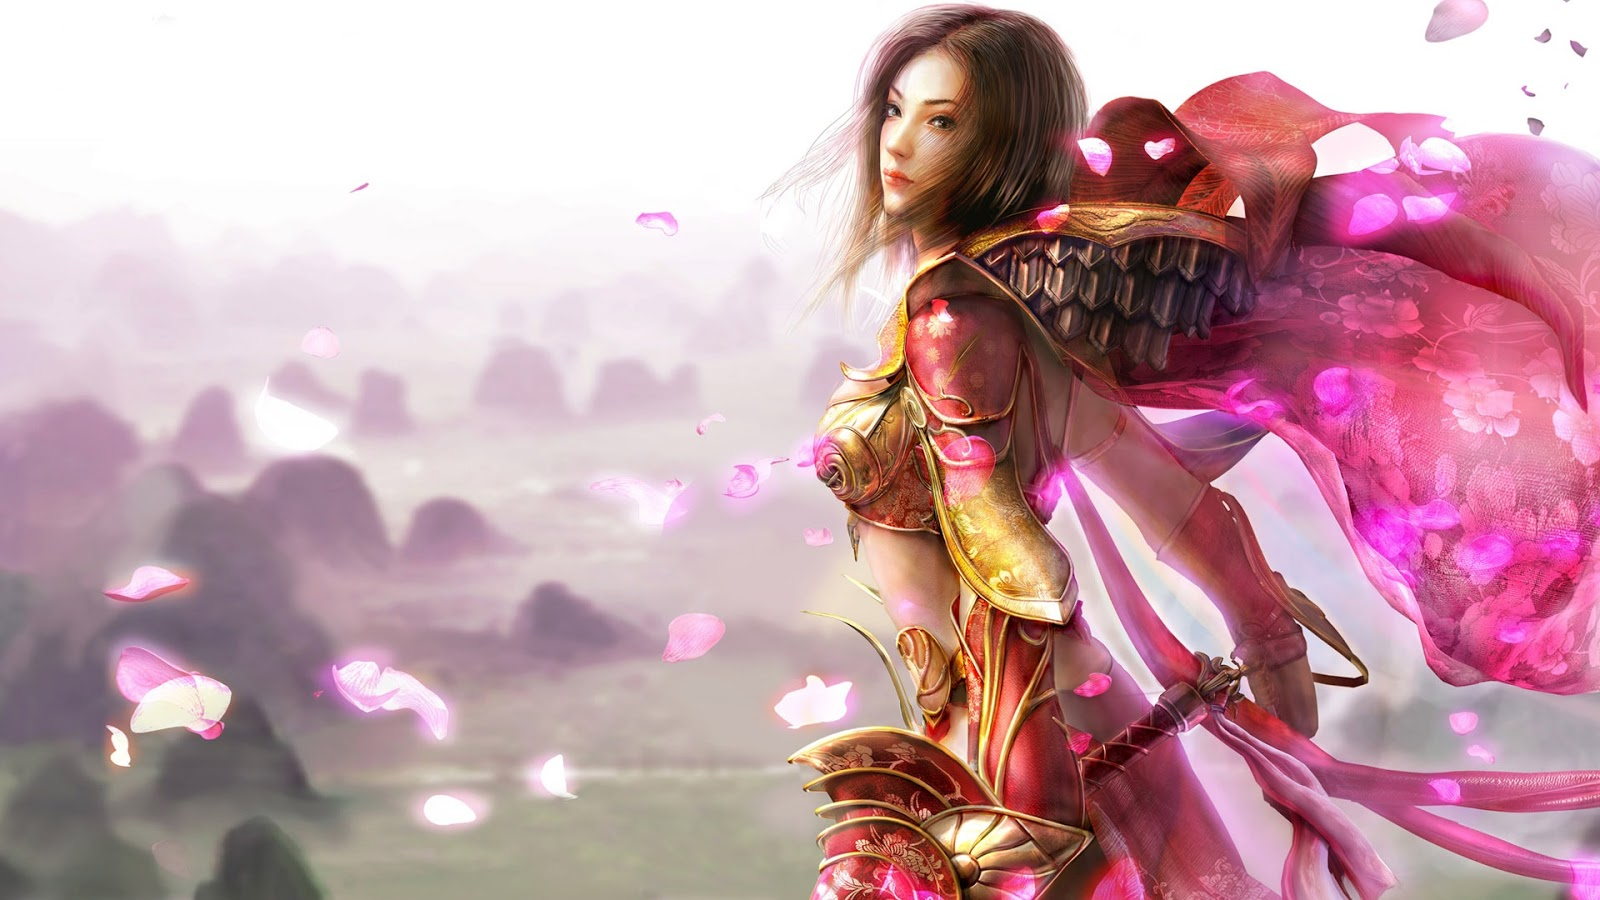 fantasy girls high quality wallpapers beautiful desktop background photographs widescreen